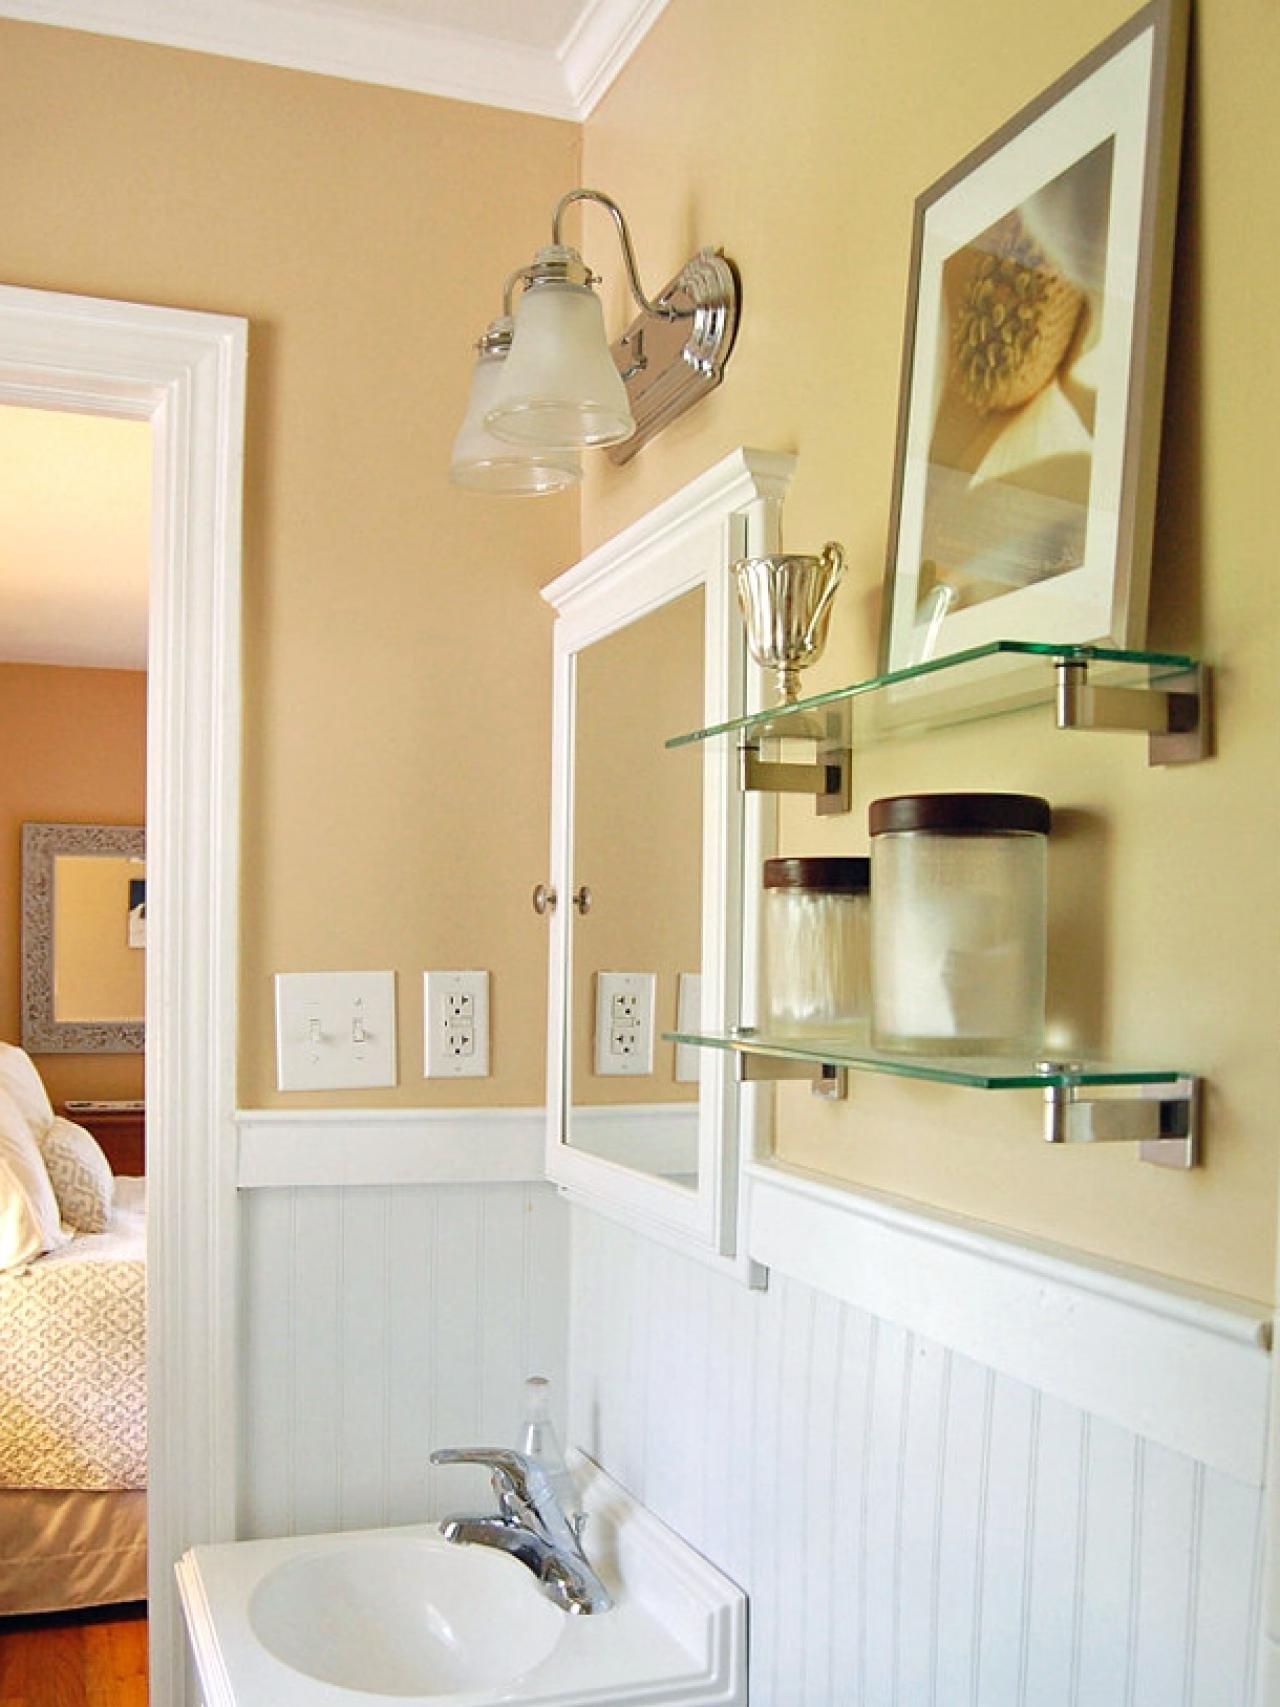 Shabby Chic Wall Mirror With Shelf